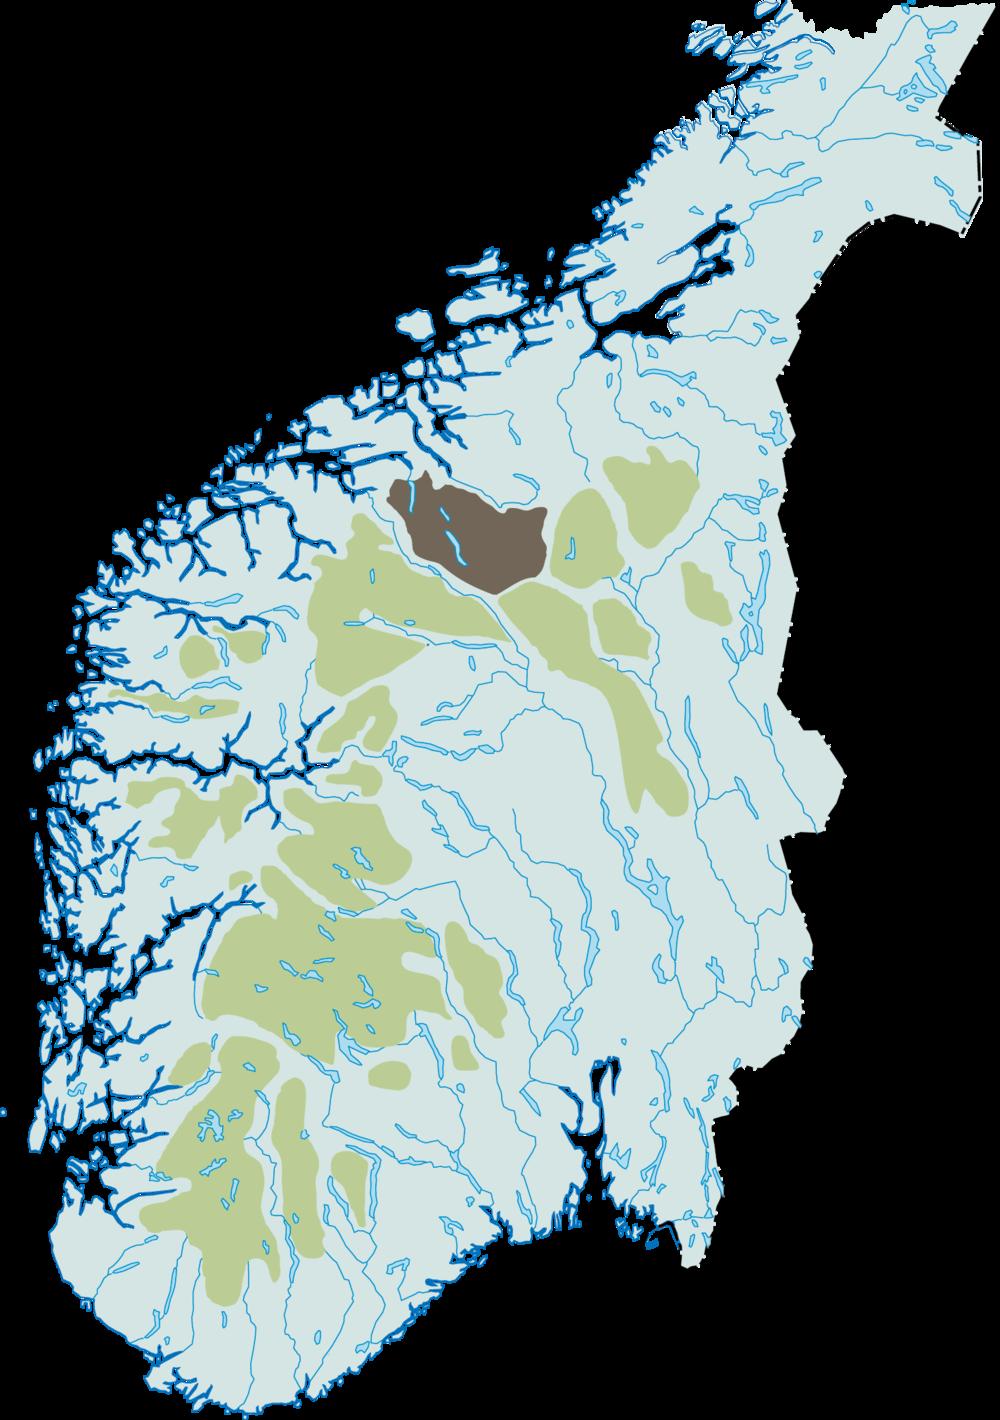 kart snøhetta Snøhetta — Villrein.no   alt om villrein kart snøhetta